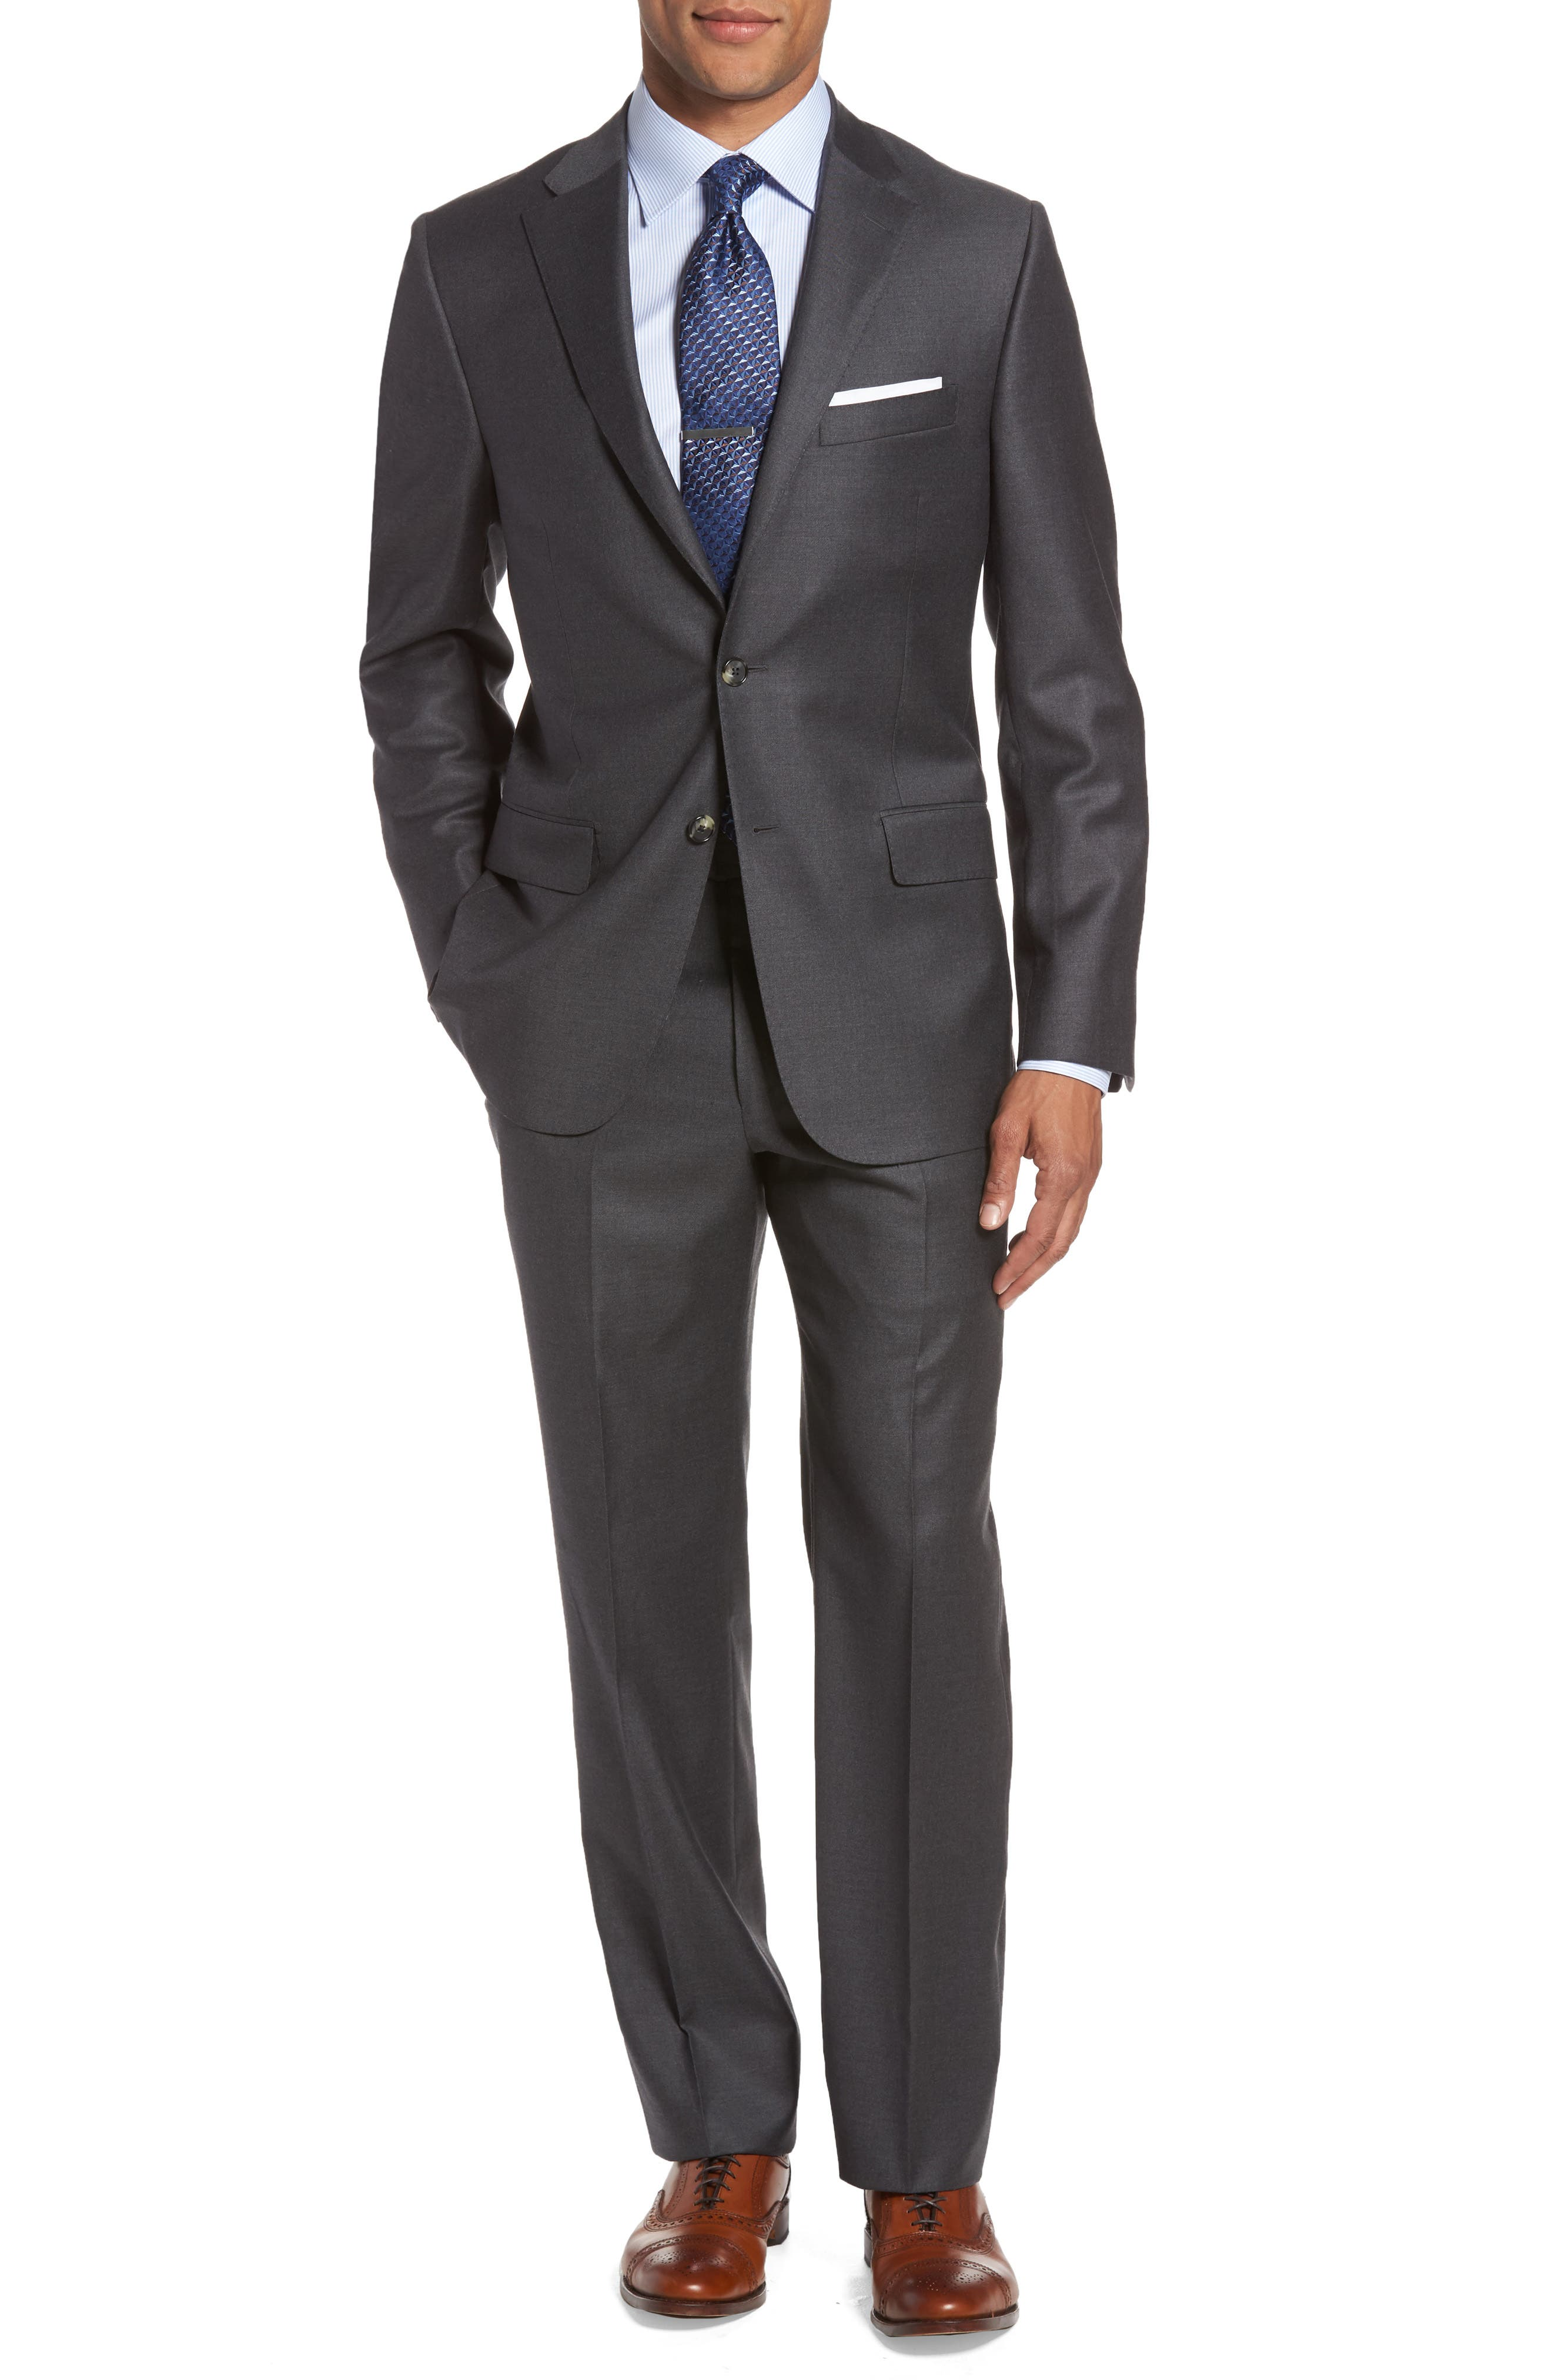 Hickey Freeman B Series Classic Fit Loro Piana Wool Suit